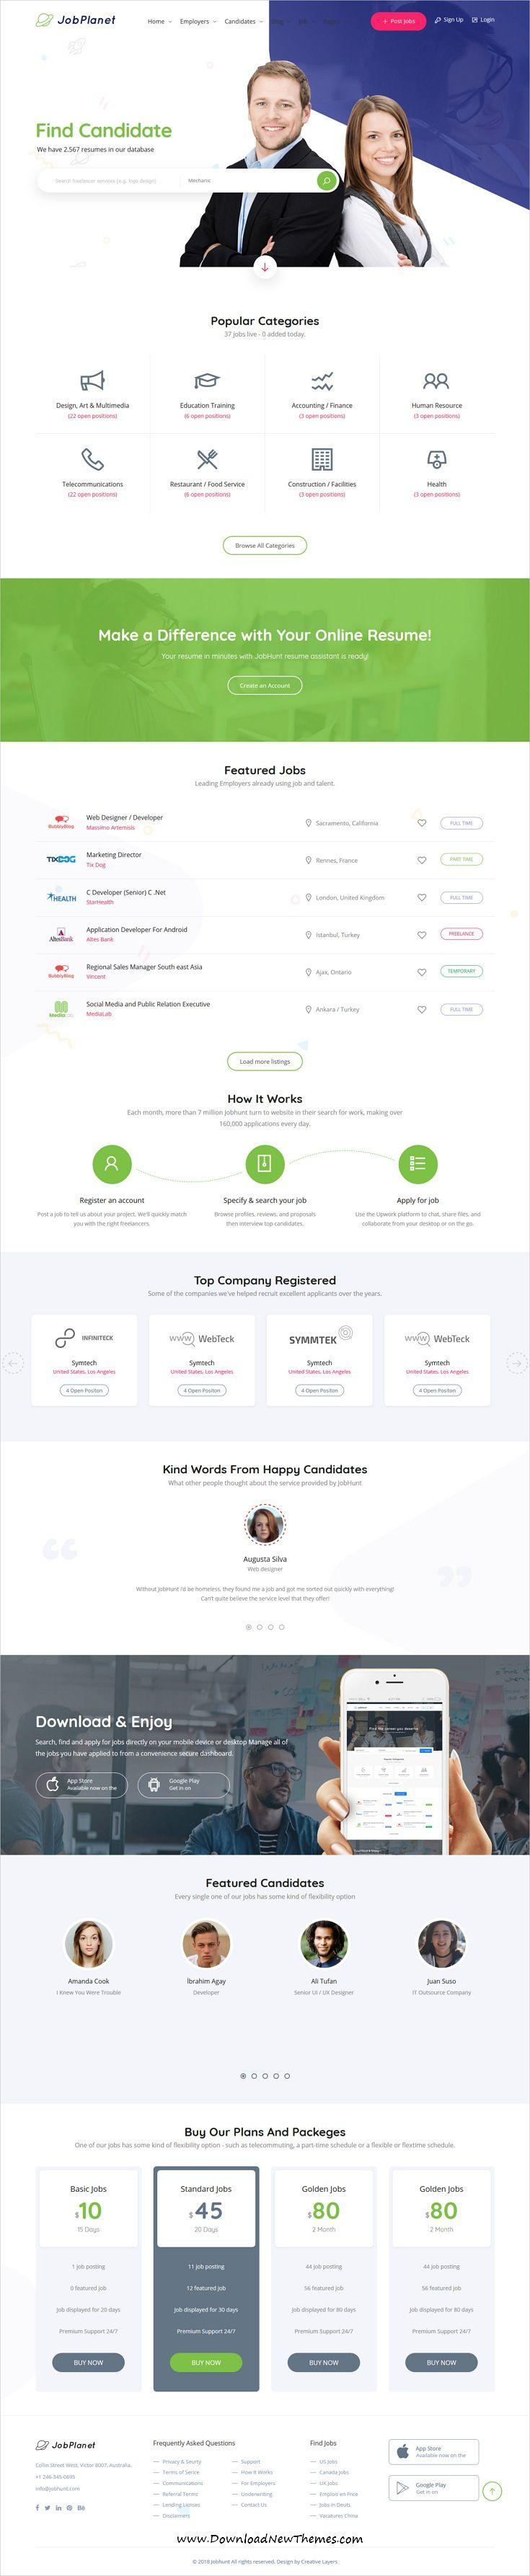 Jobhunt Job Board Html Template Html Templates Web Design Job Board